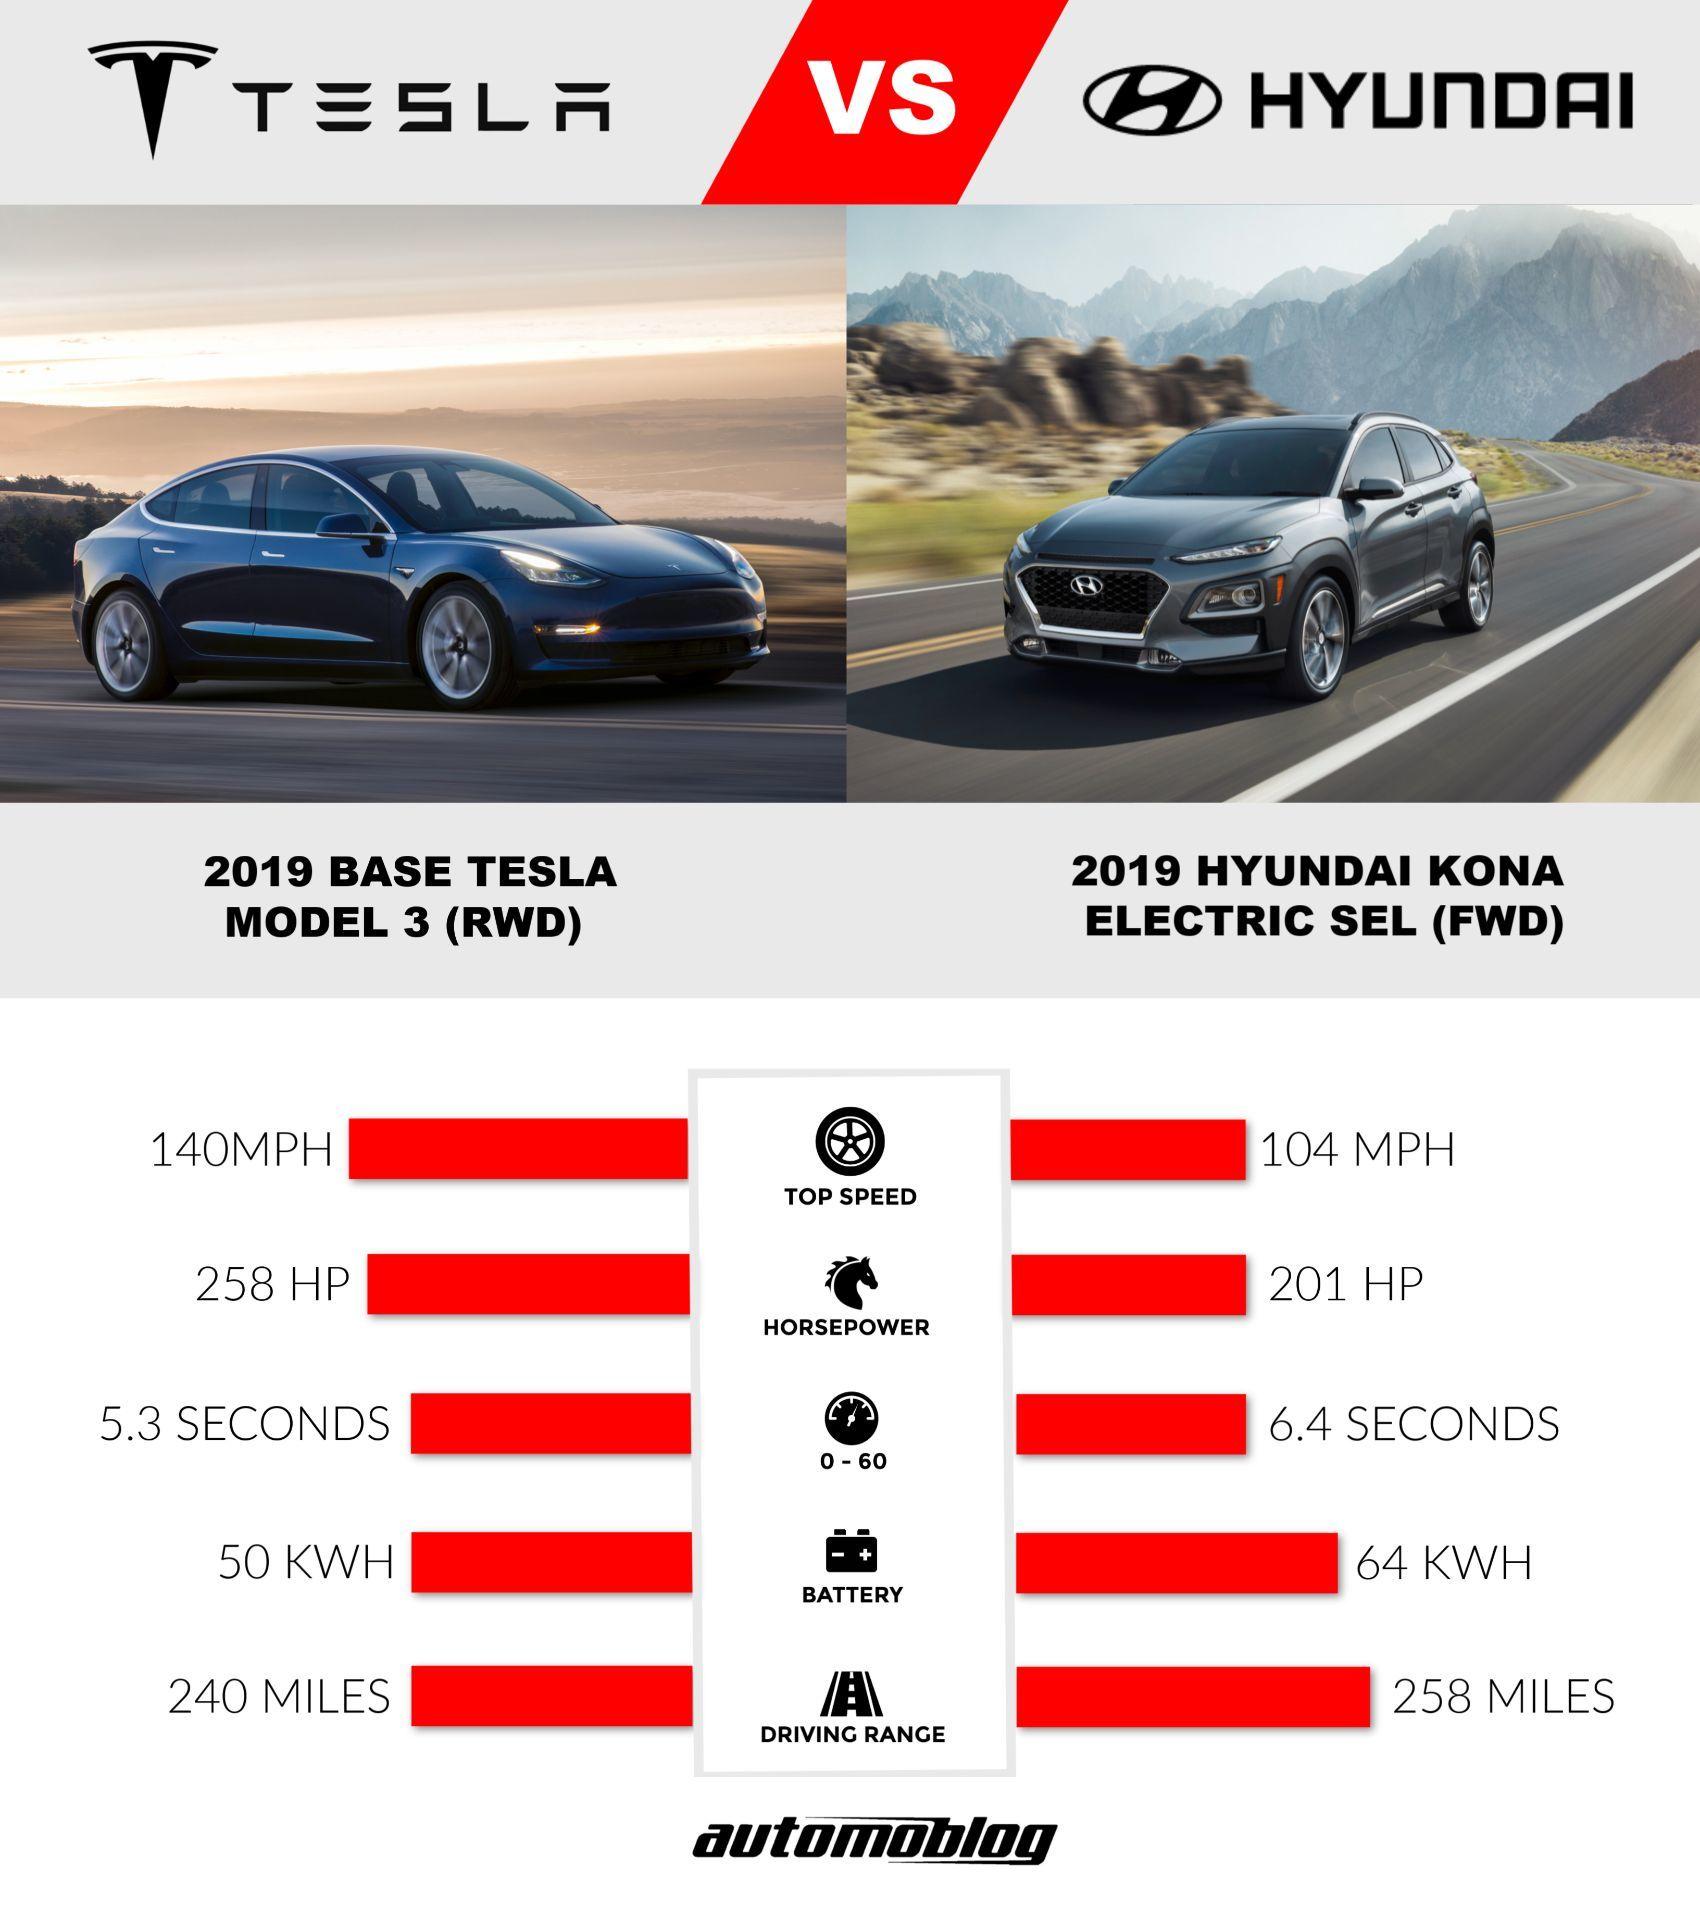 Virtual Showdown: Tesla Model 3 Versus Hyundai Kona Electric